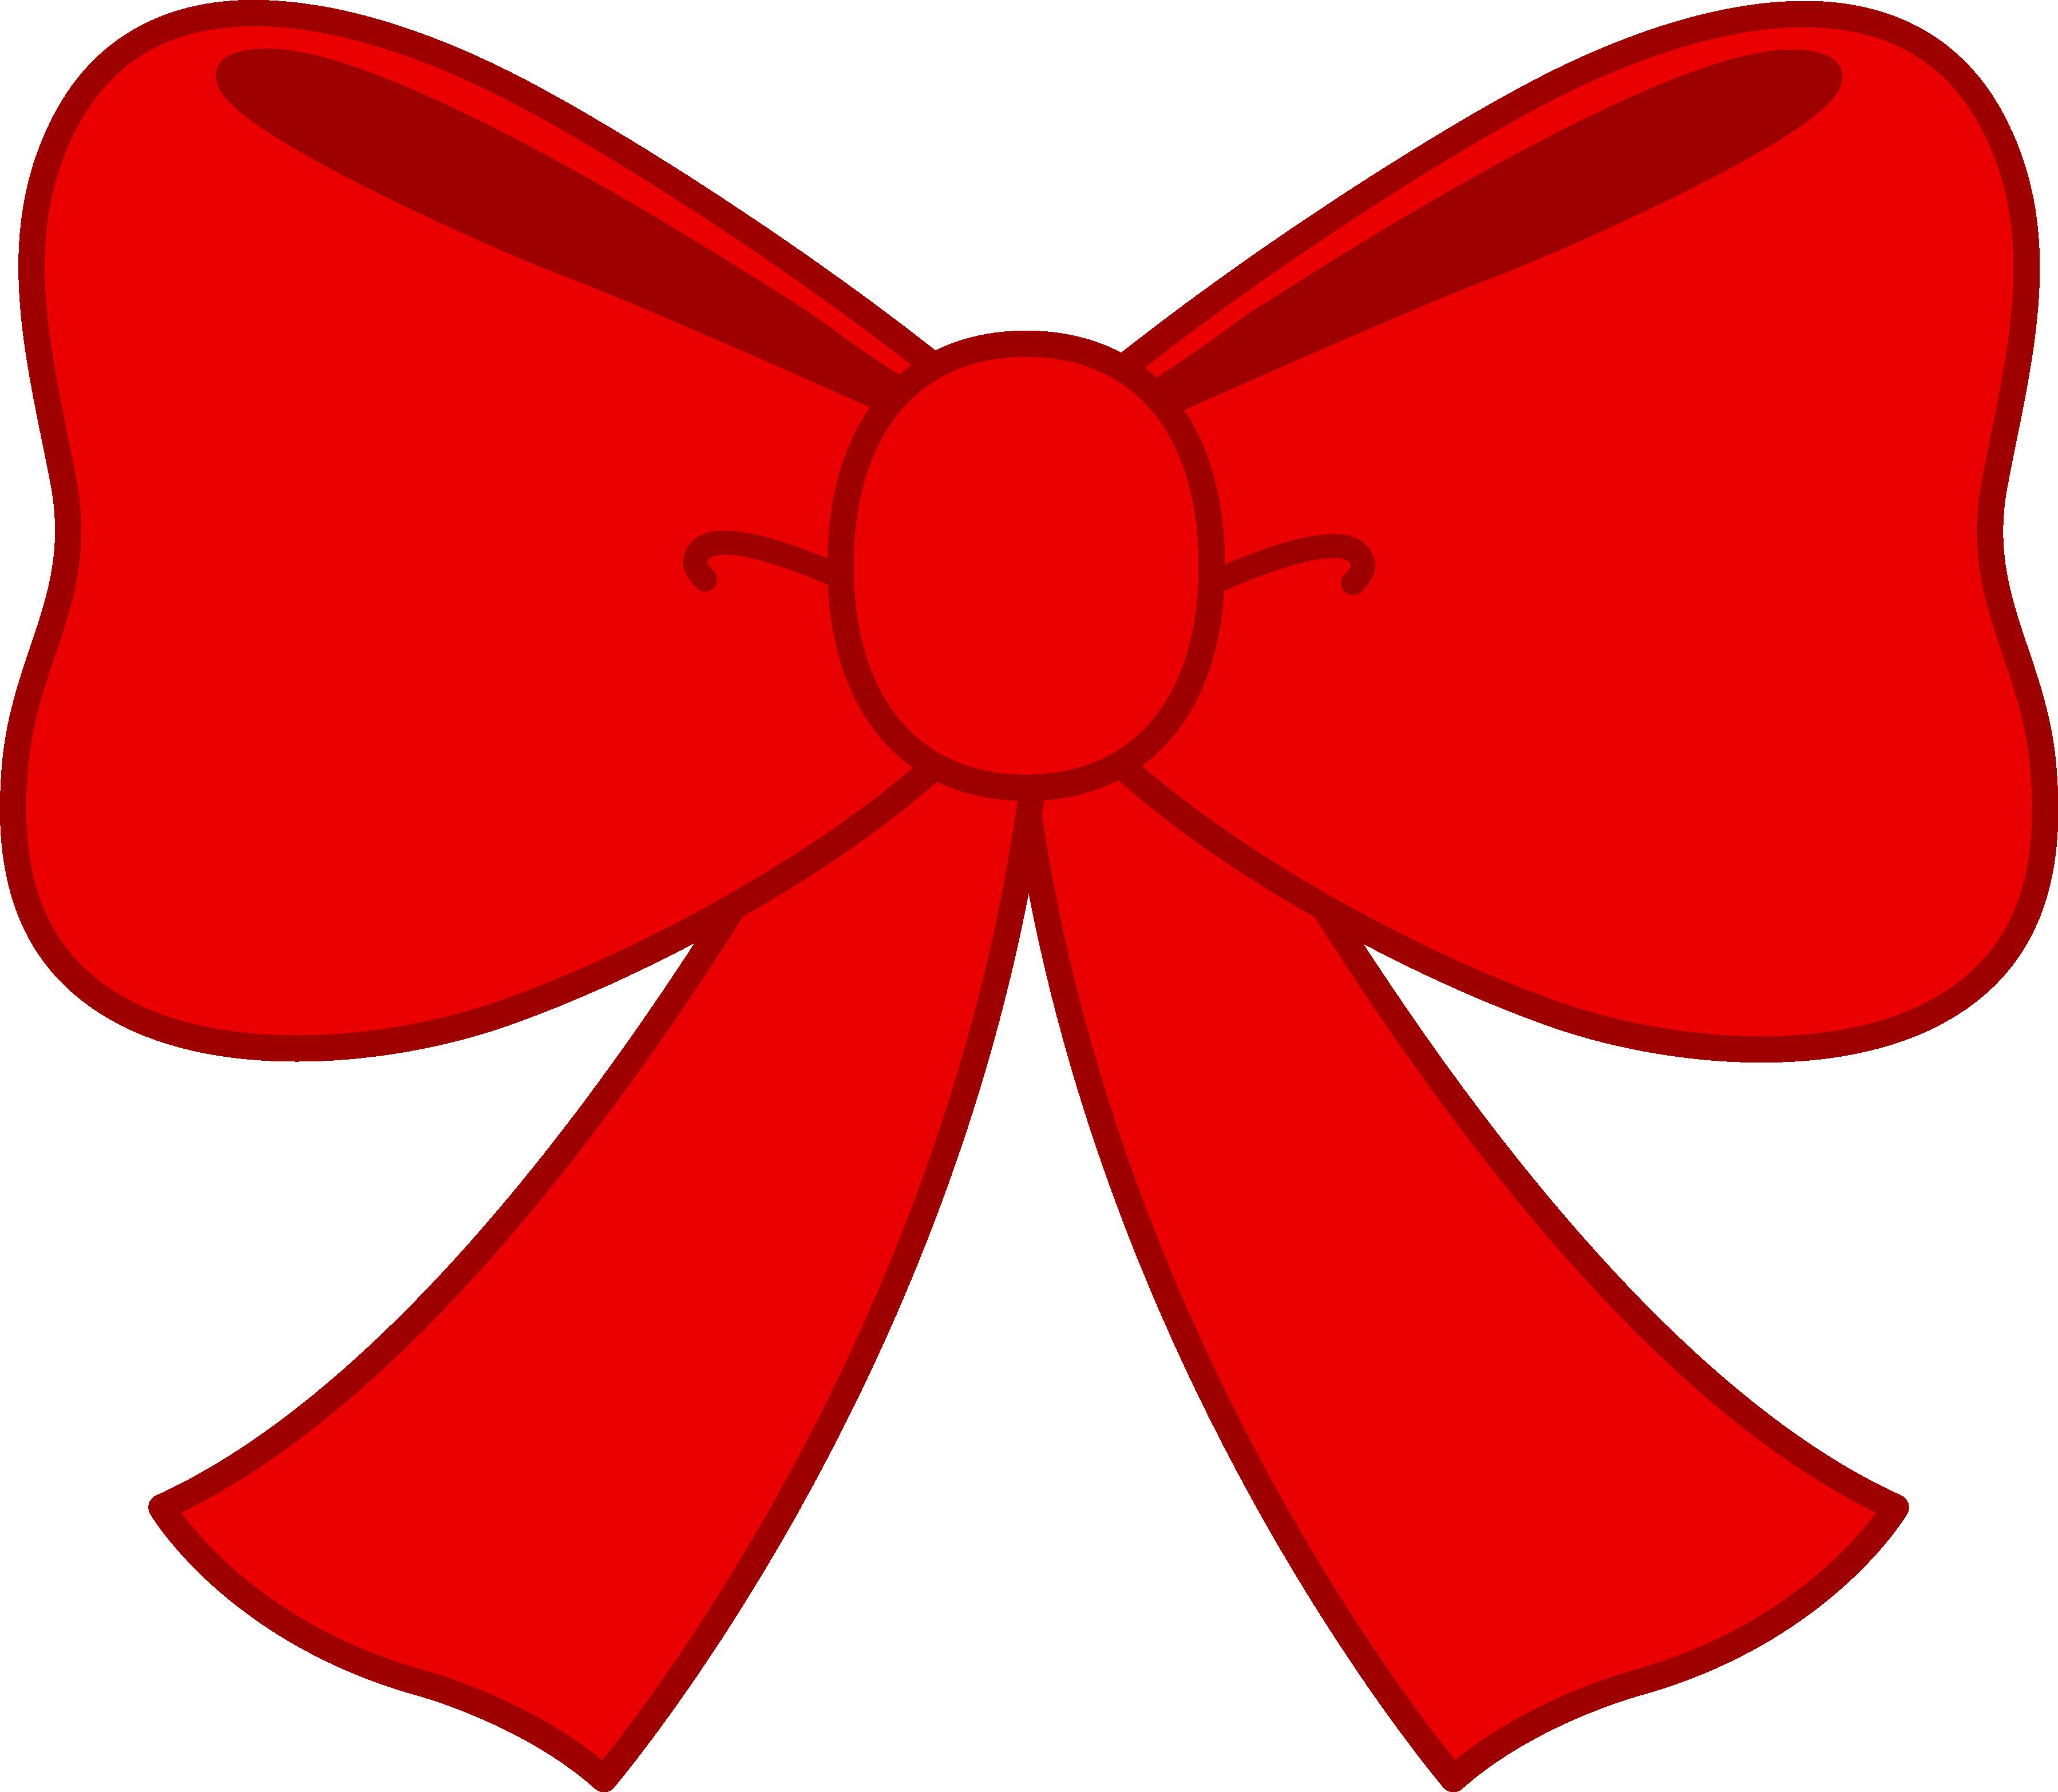 Ribbon Clipart Free Clipart Images-Ribbon clipart free clipart images-13